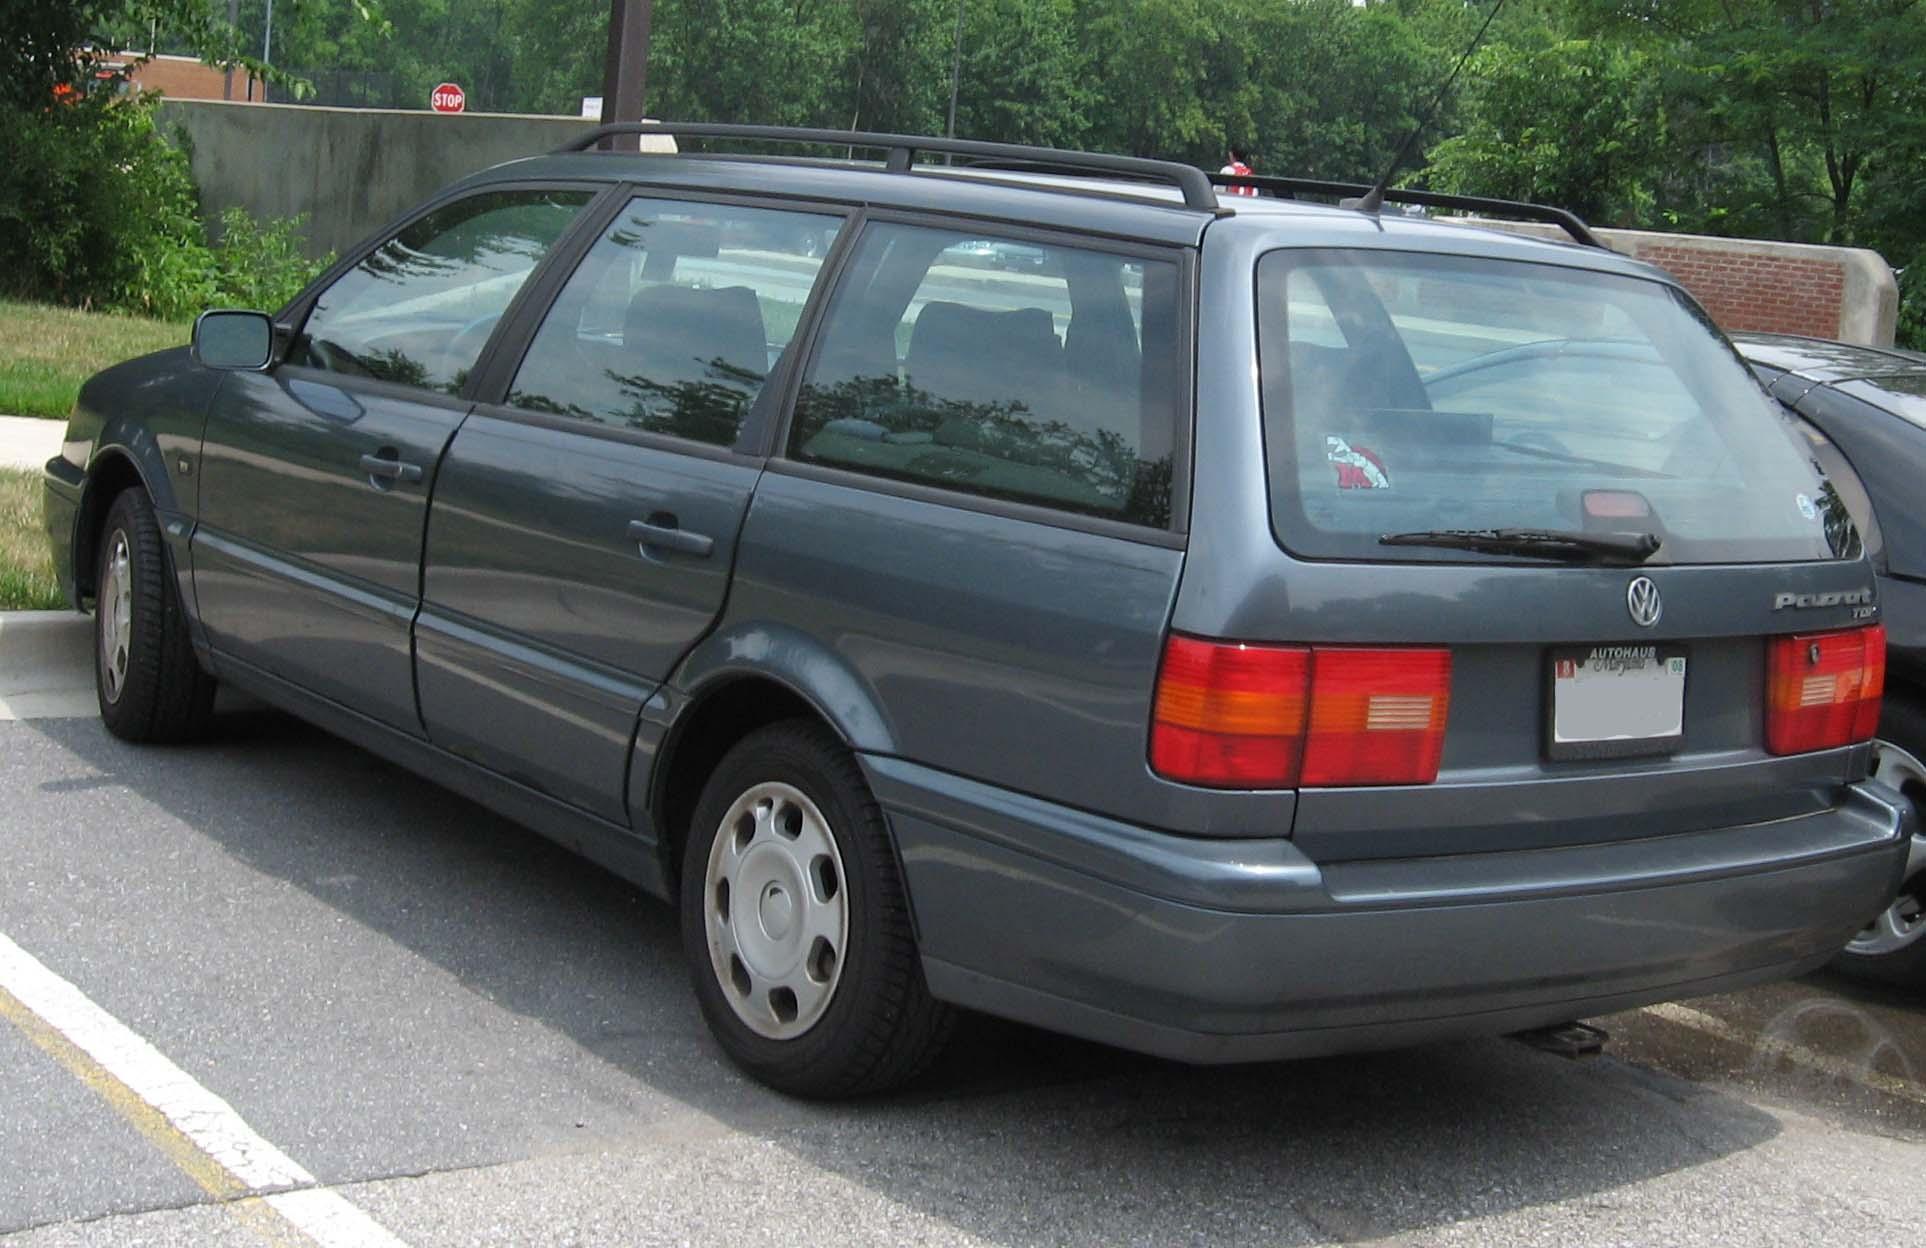 File:Volkswagen-Passat-TDI-wagon-B4.jpg